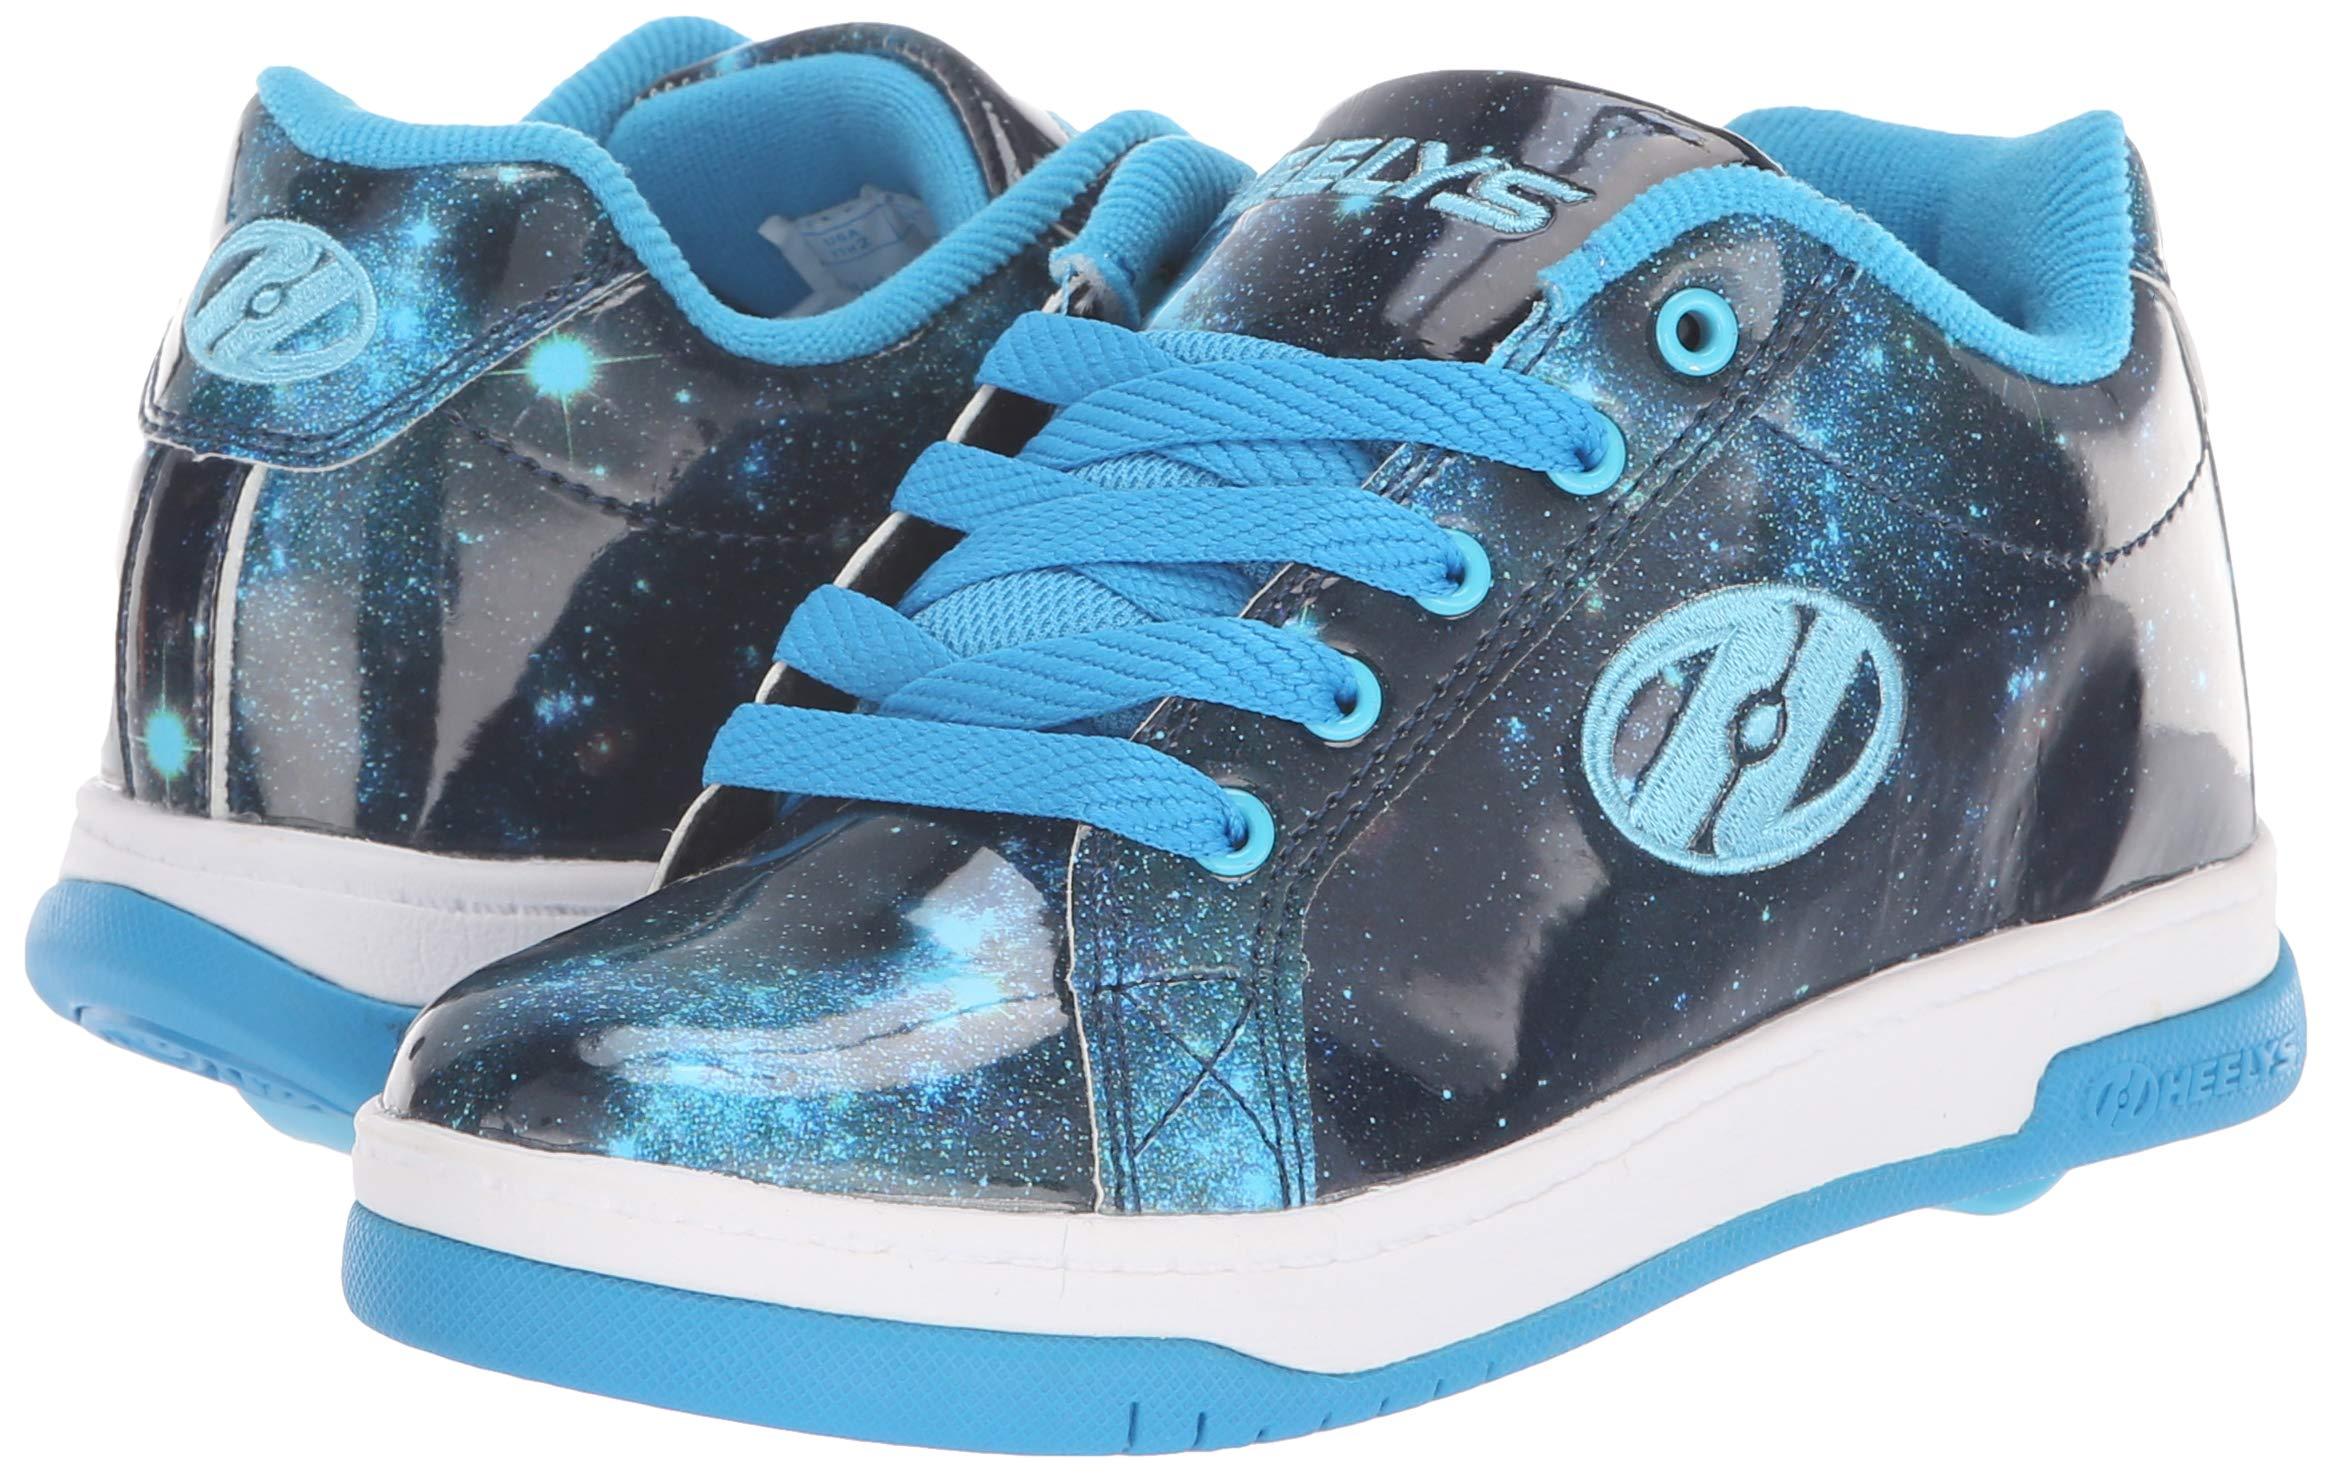 Heelys Girls' Split Tennis Shoe Blue/Galaxy 2 M US Big Kid by Heelys (Image #6)